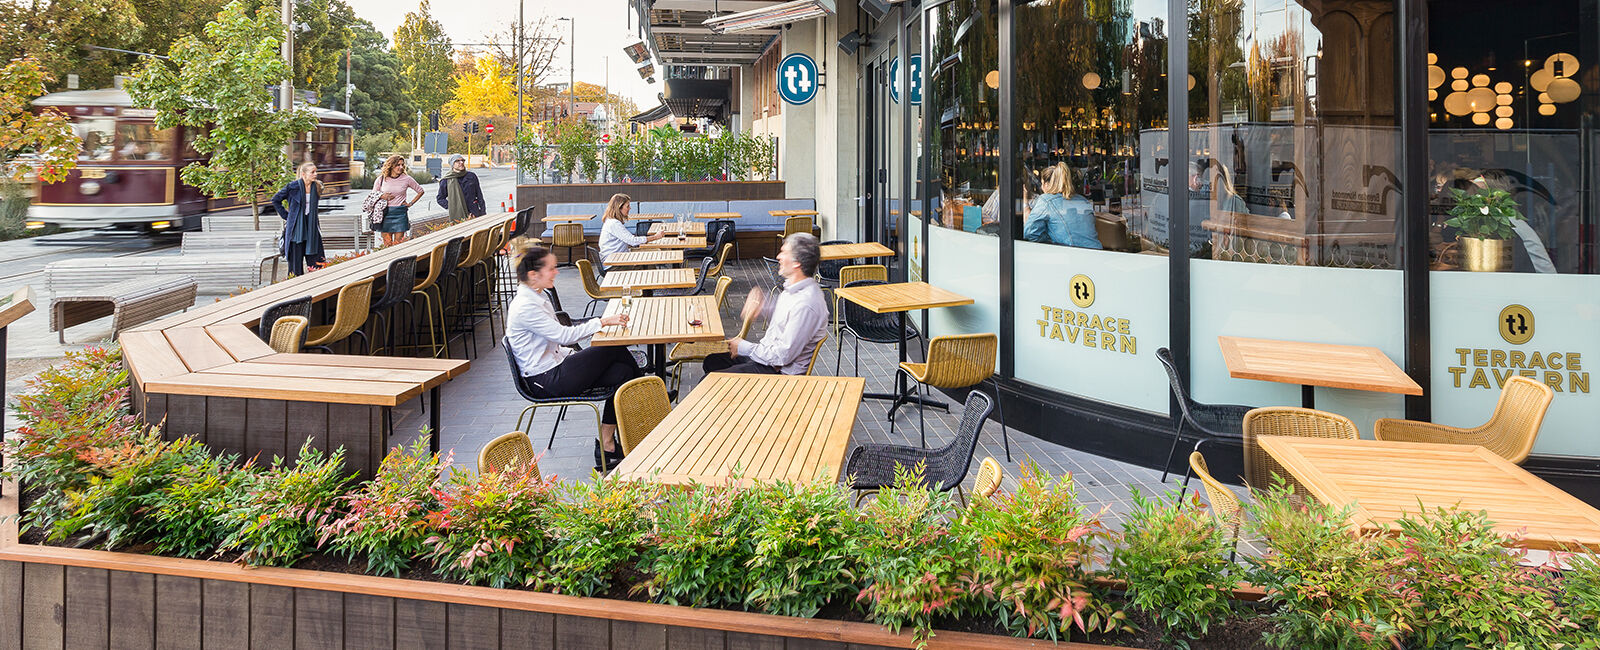 Bar Furniture Chairs Bar Stools Tables